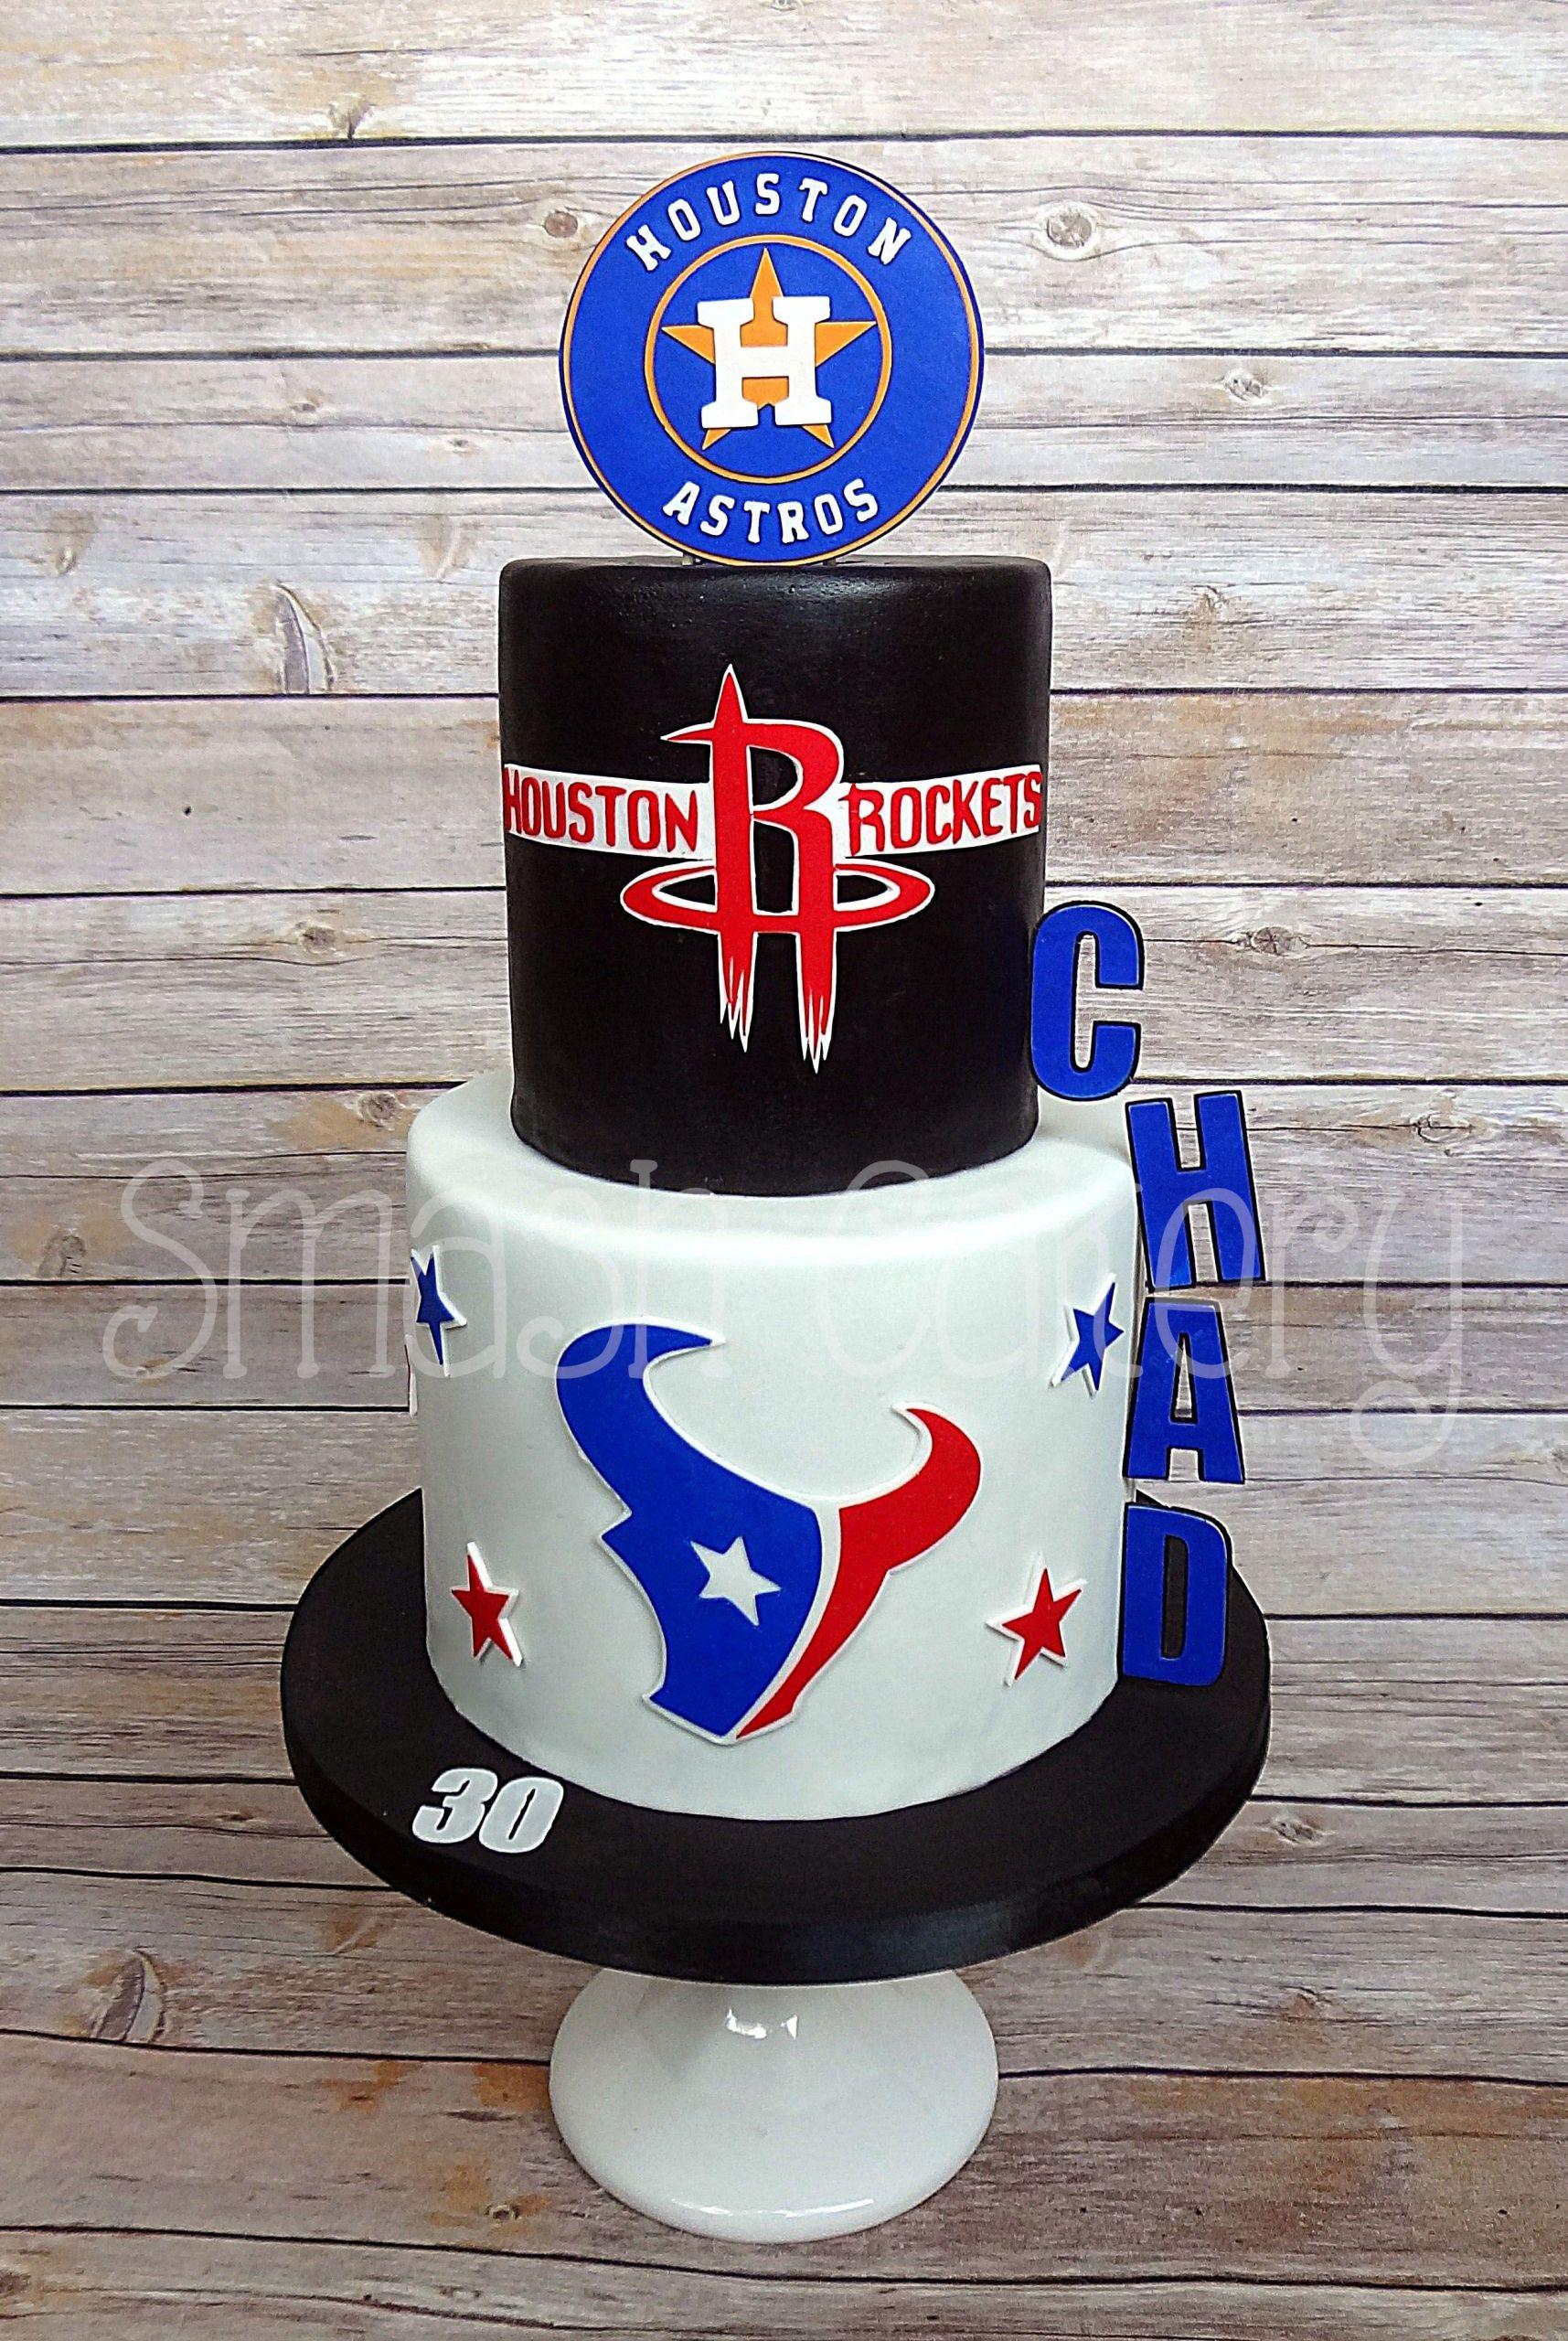 Birthday Cakes Houston  Houston Astros Rockets and Texans themed fondant cake